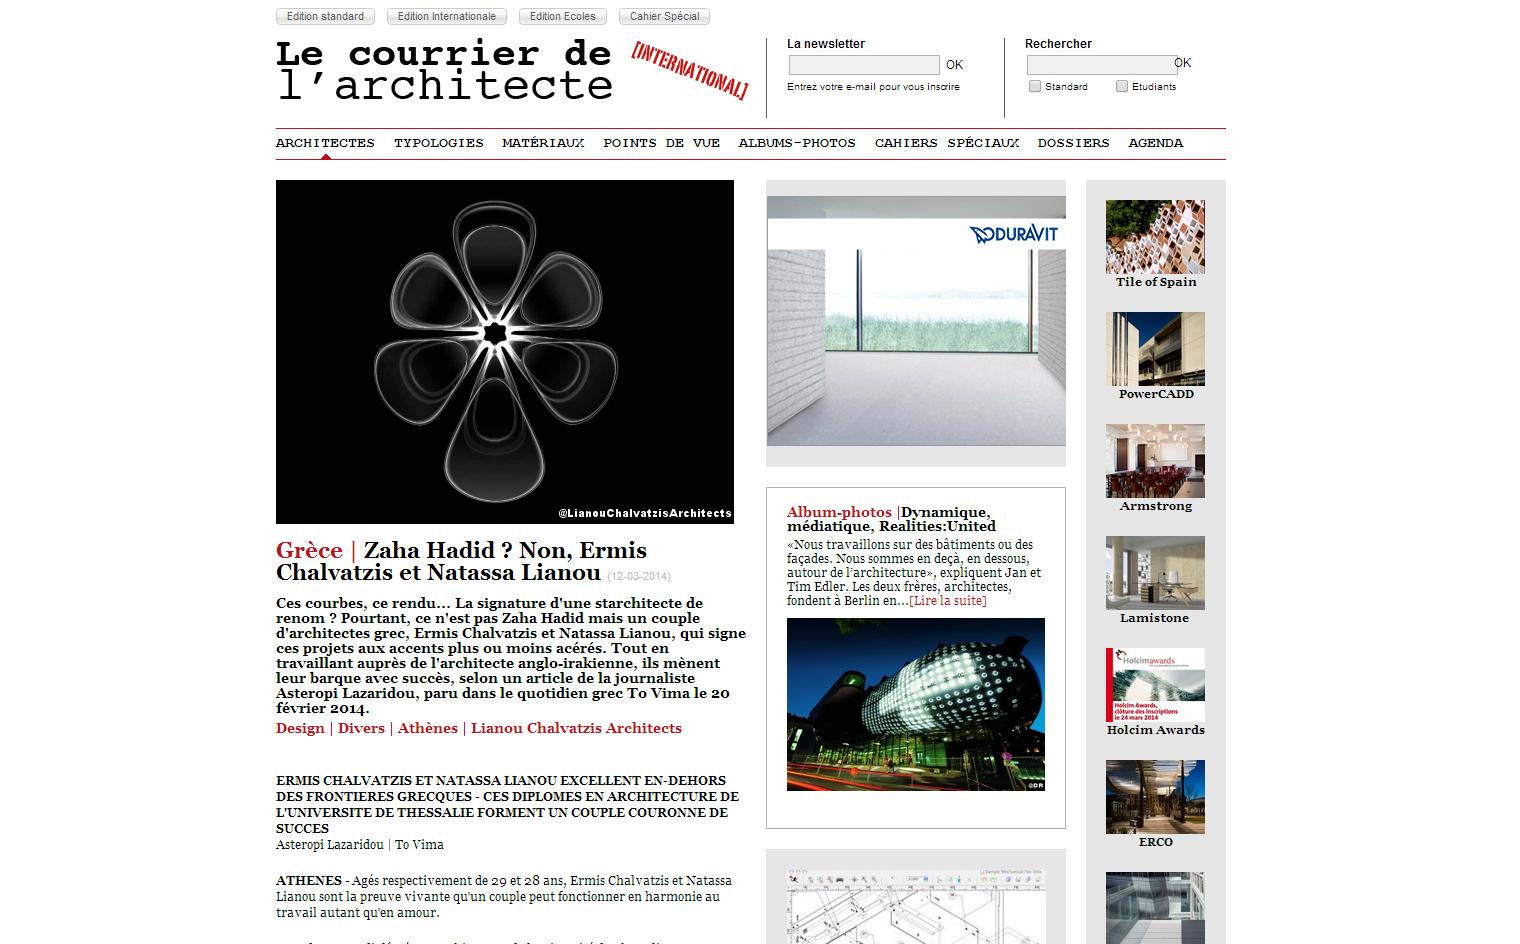 120314_Le Courrierdelarchitecte.jpg